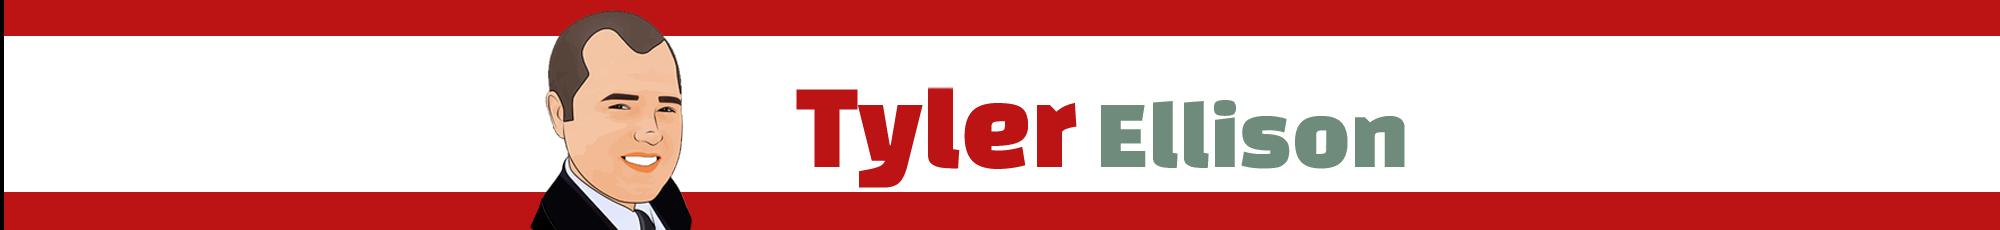 Tyler Ellison's Blog